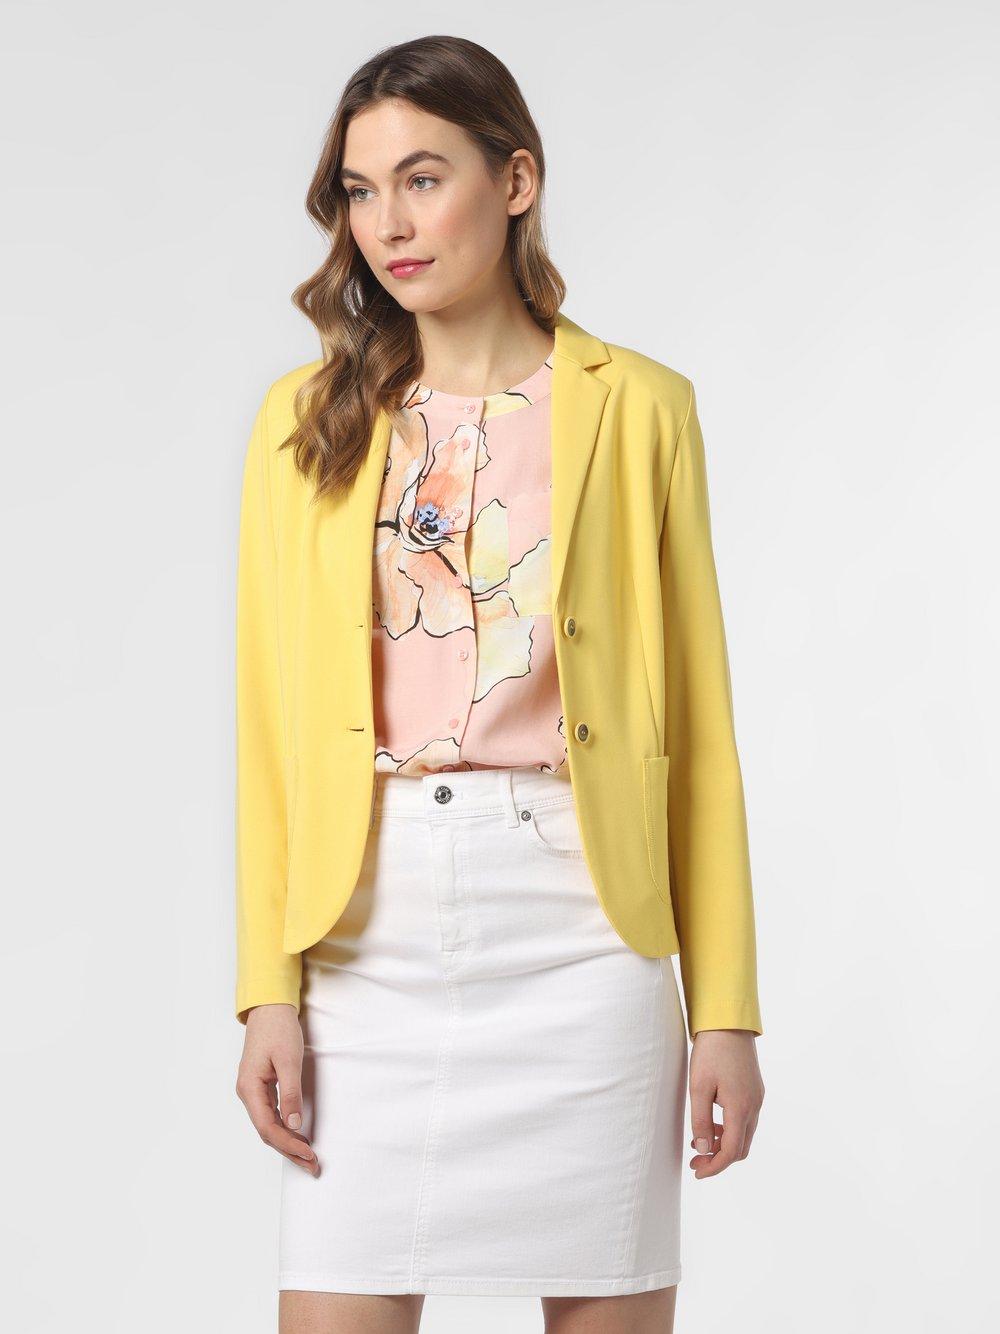 Rofa – Blezer damski, żółty Van Graaf 470650-0002-00400